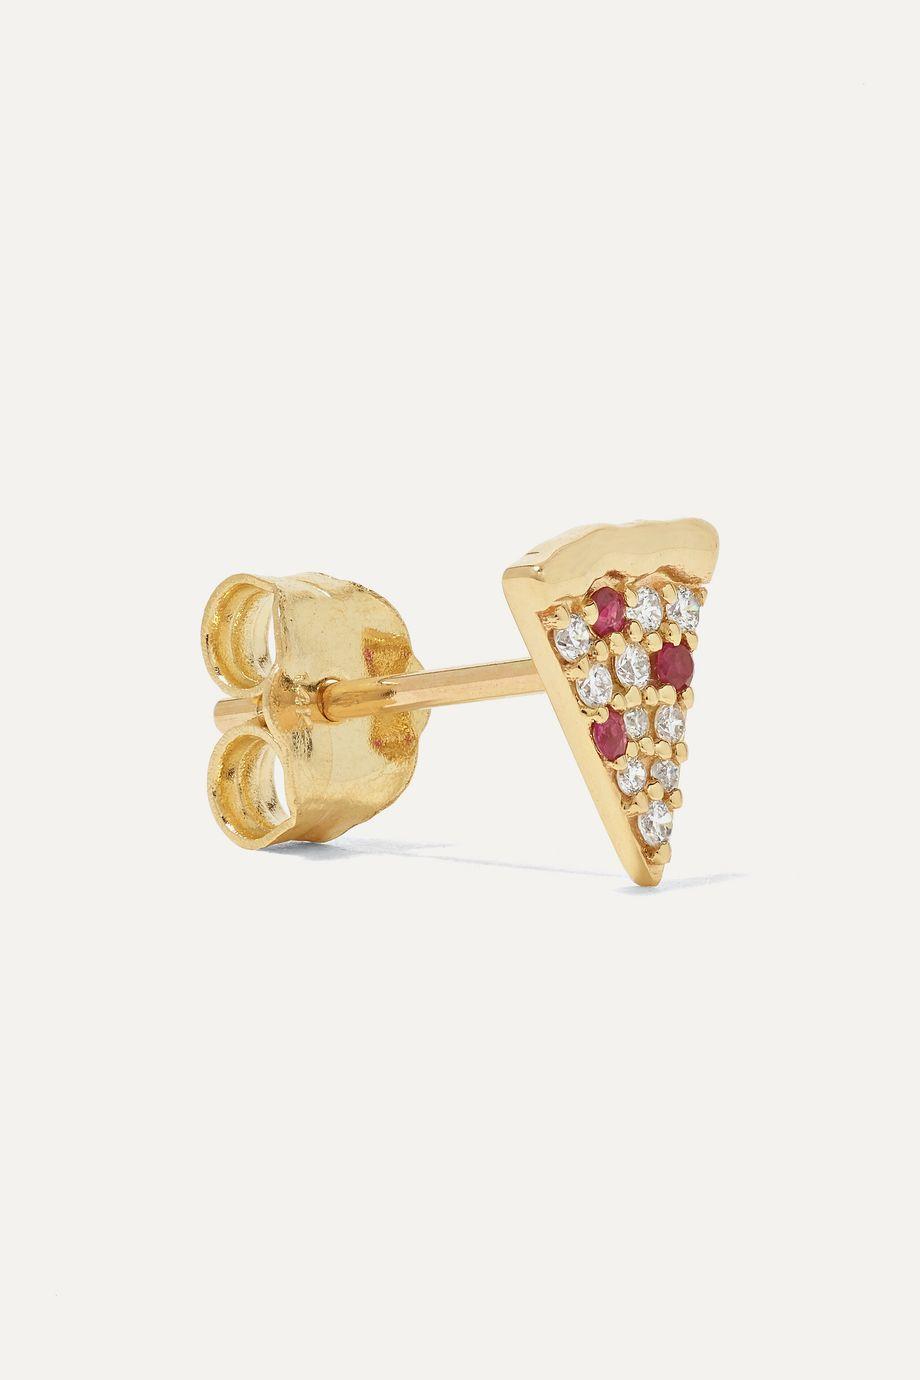 Sydney Evan 14-karat gold, diamond and ruby earrings